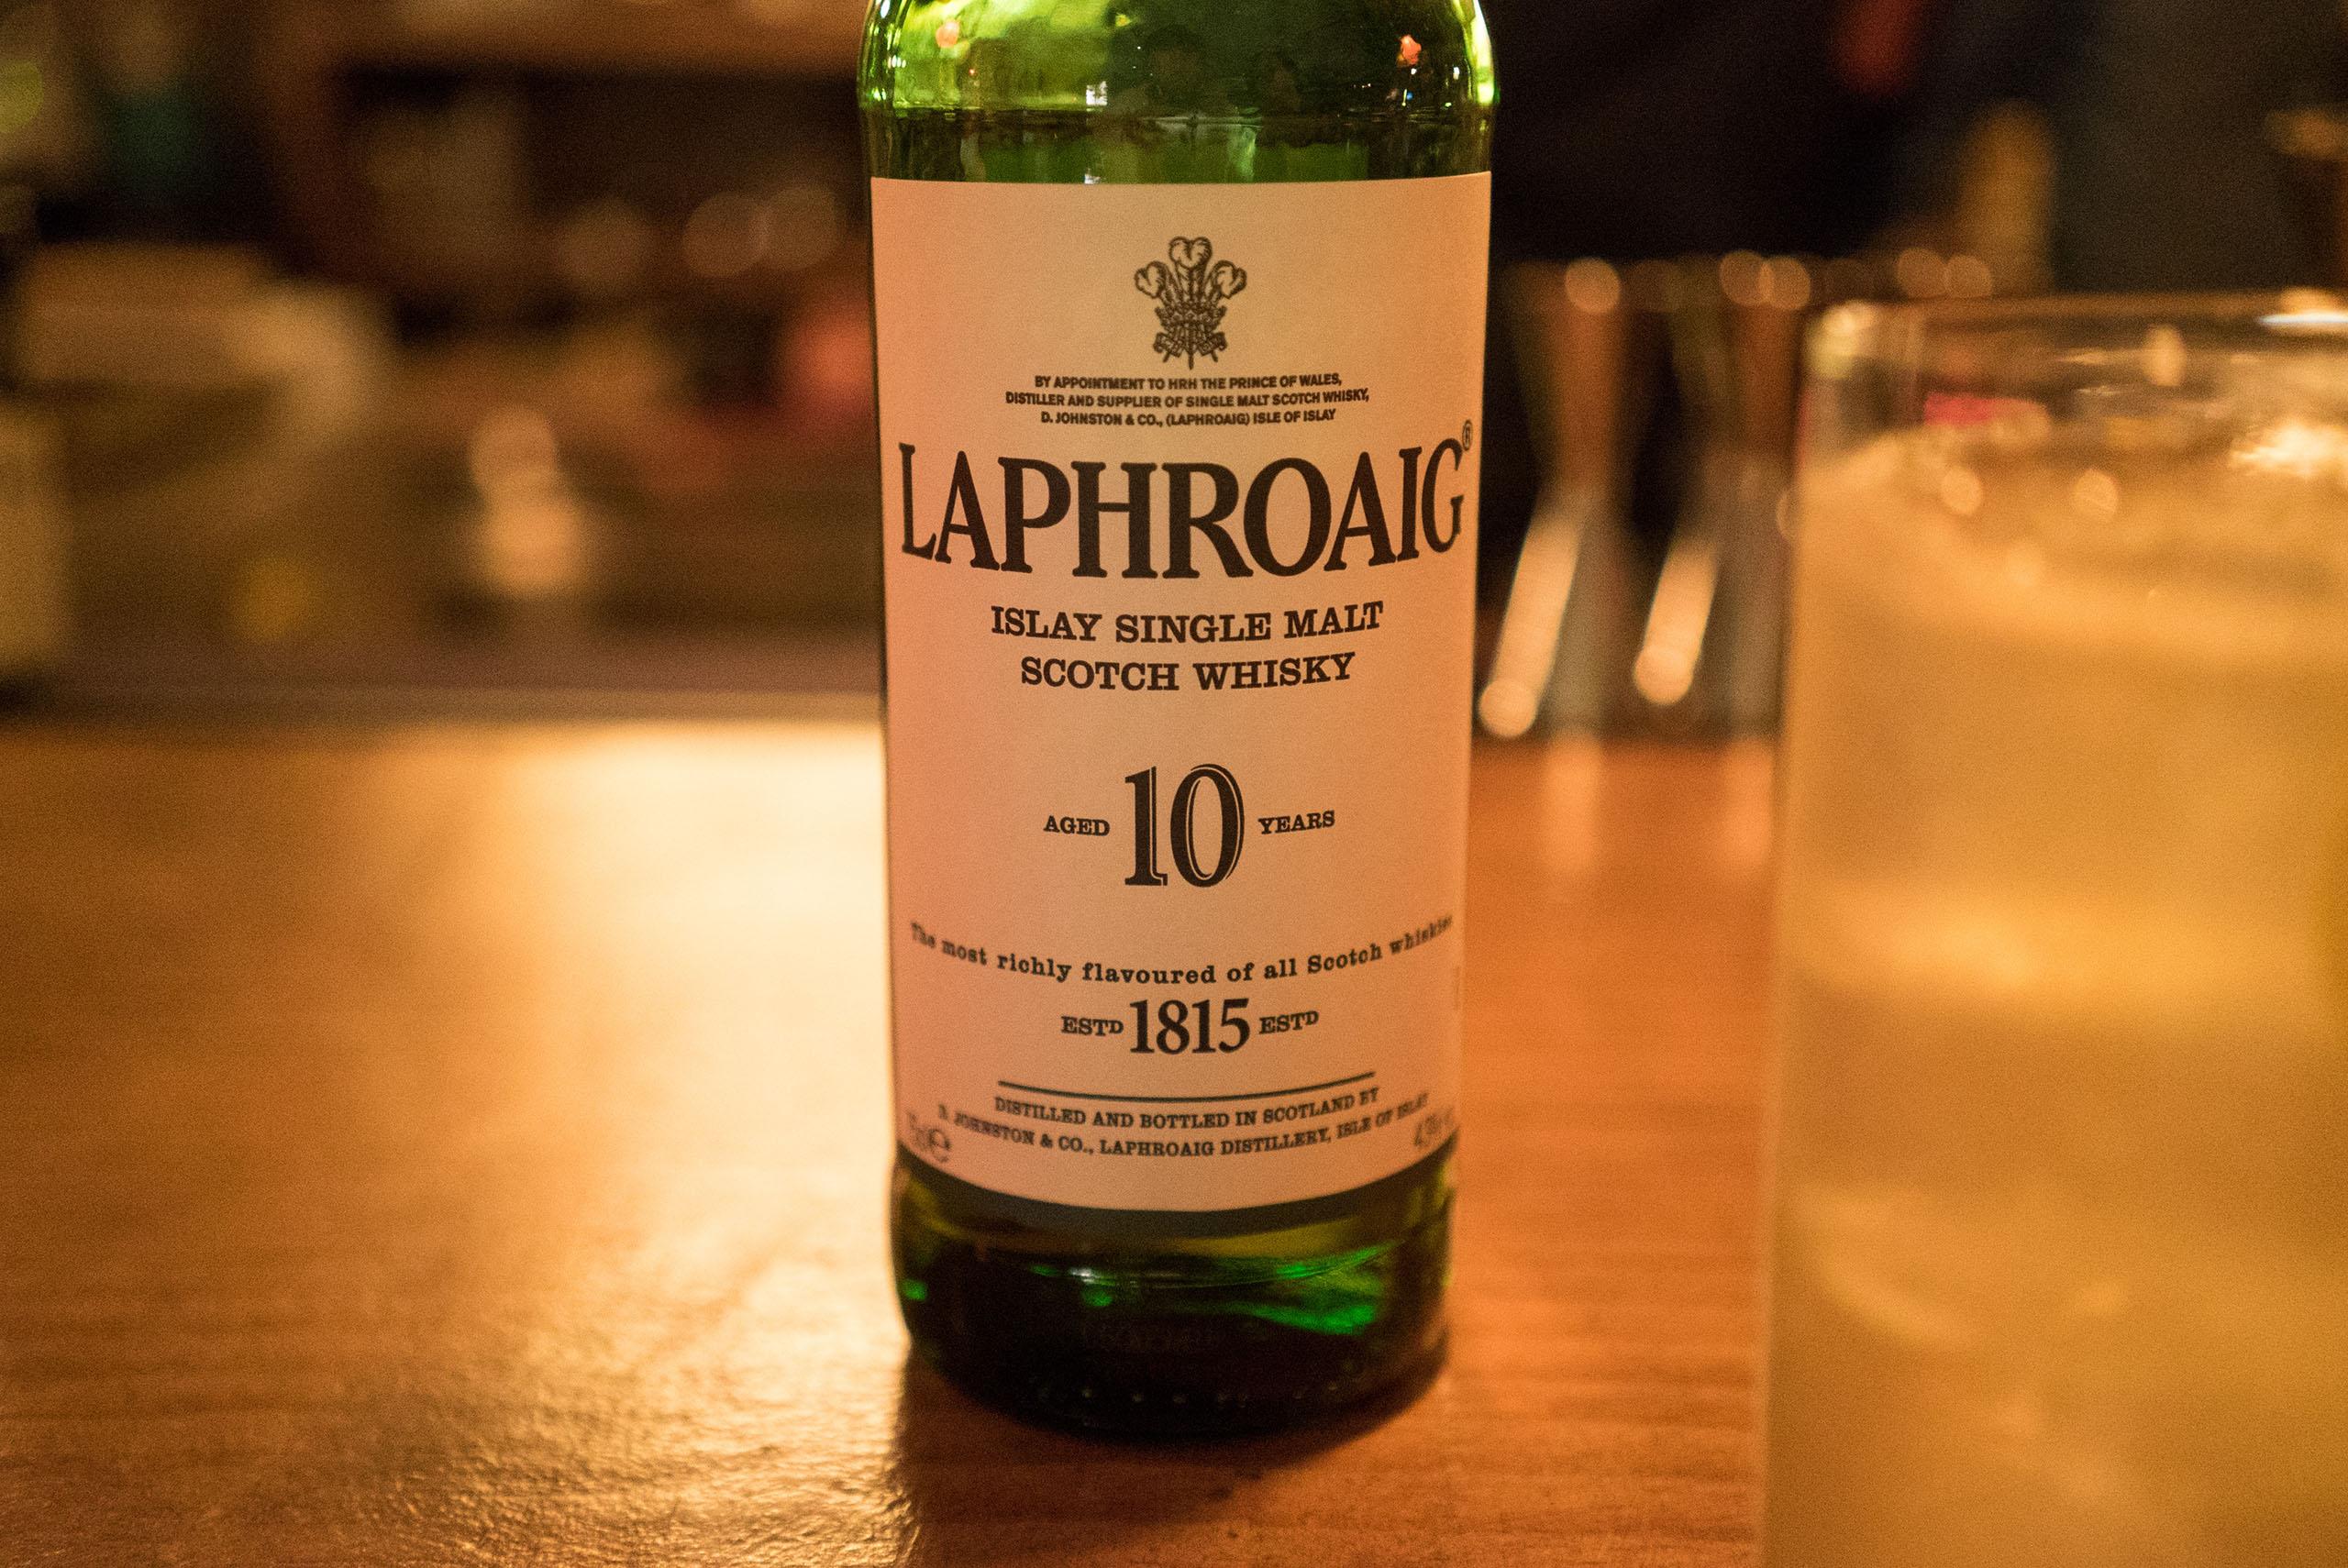 Laphroaig 10 Years Old